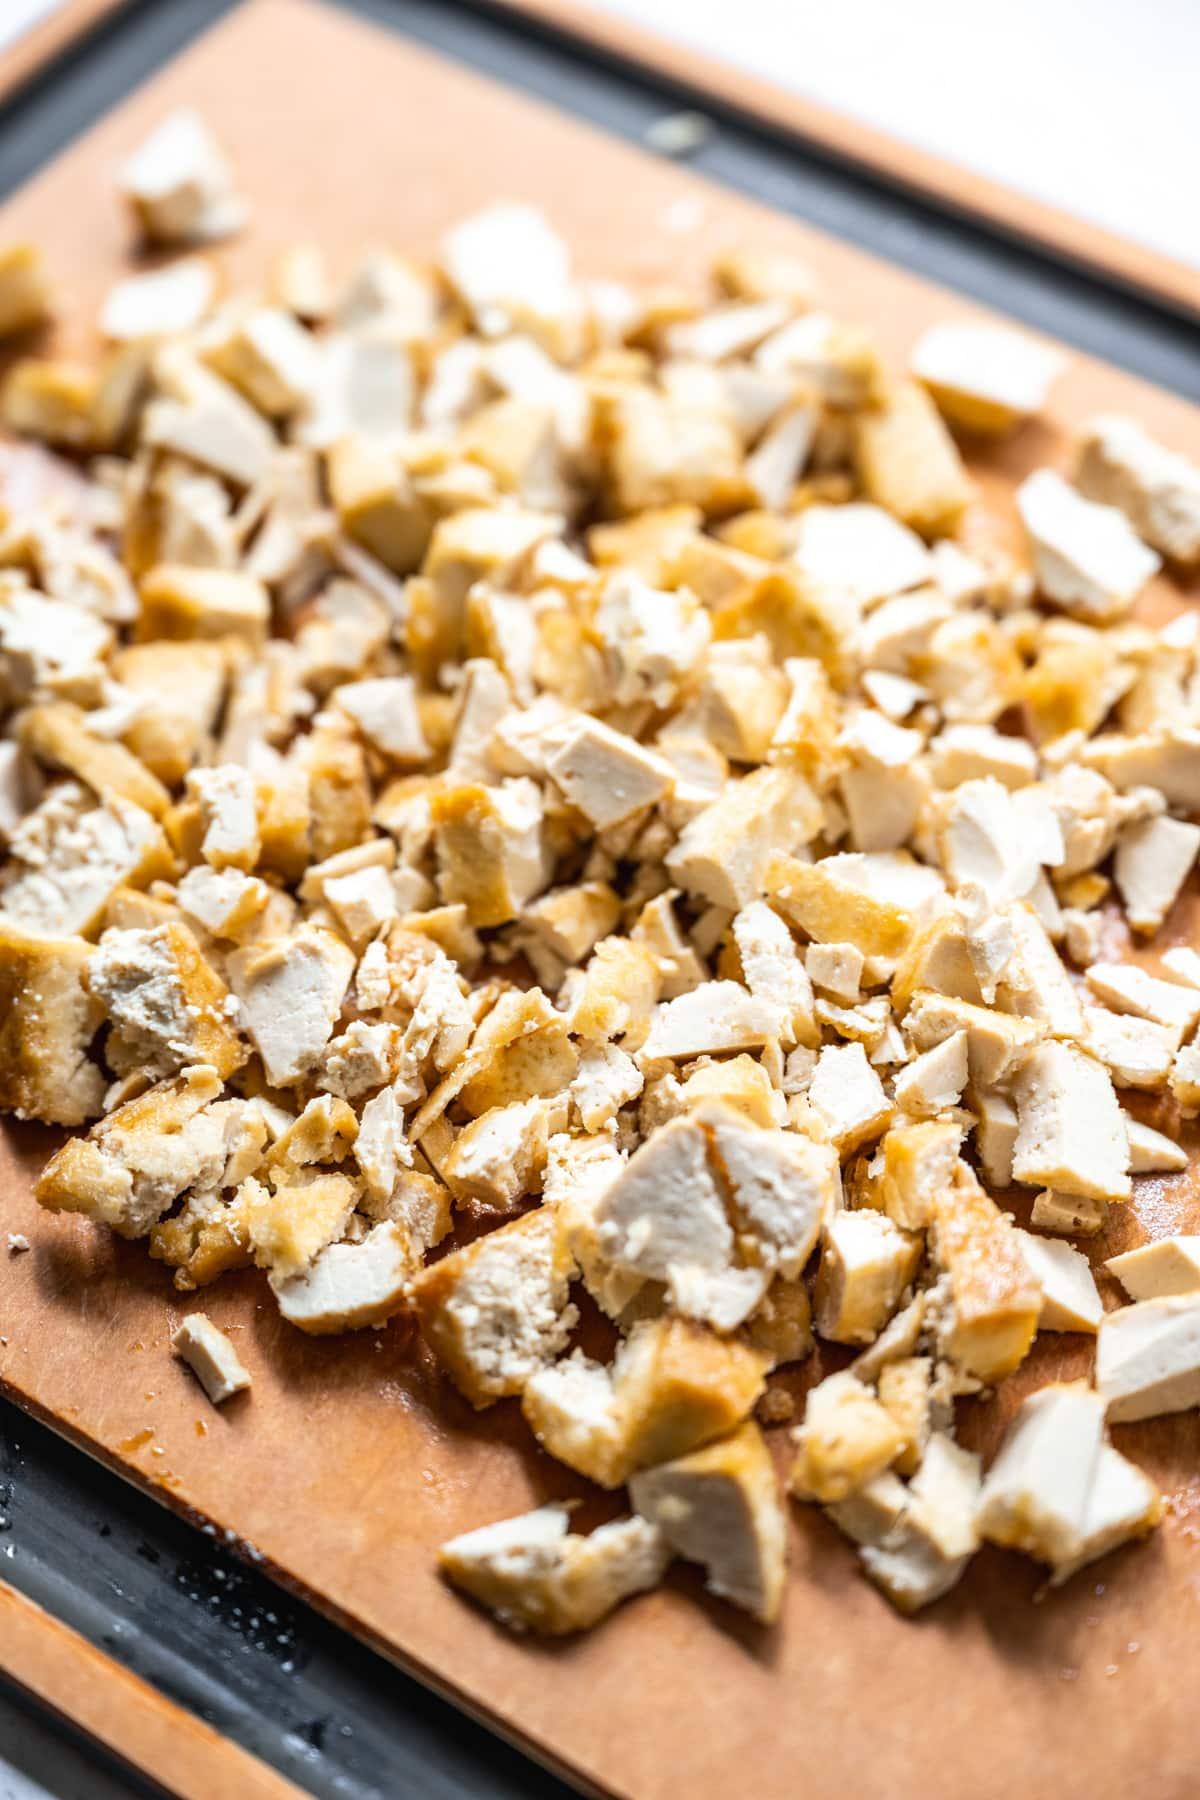 close up view of chopped, crispy tofu on a cutting board.